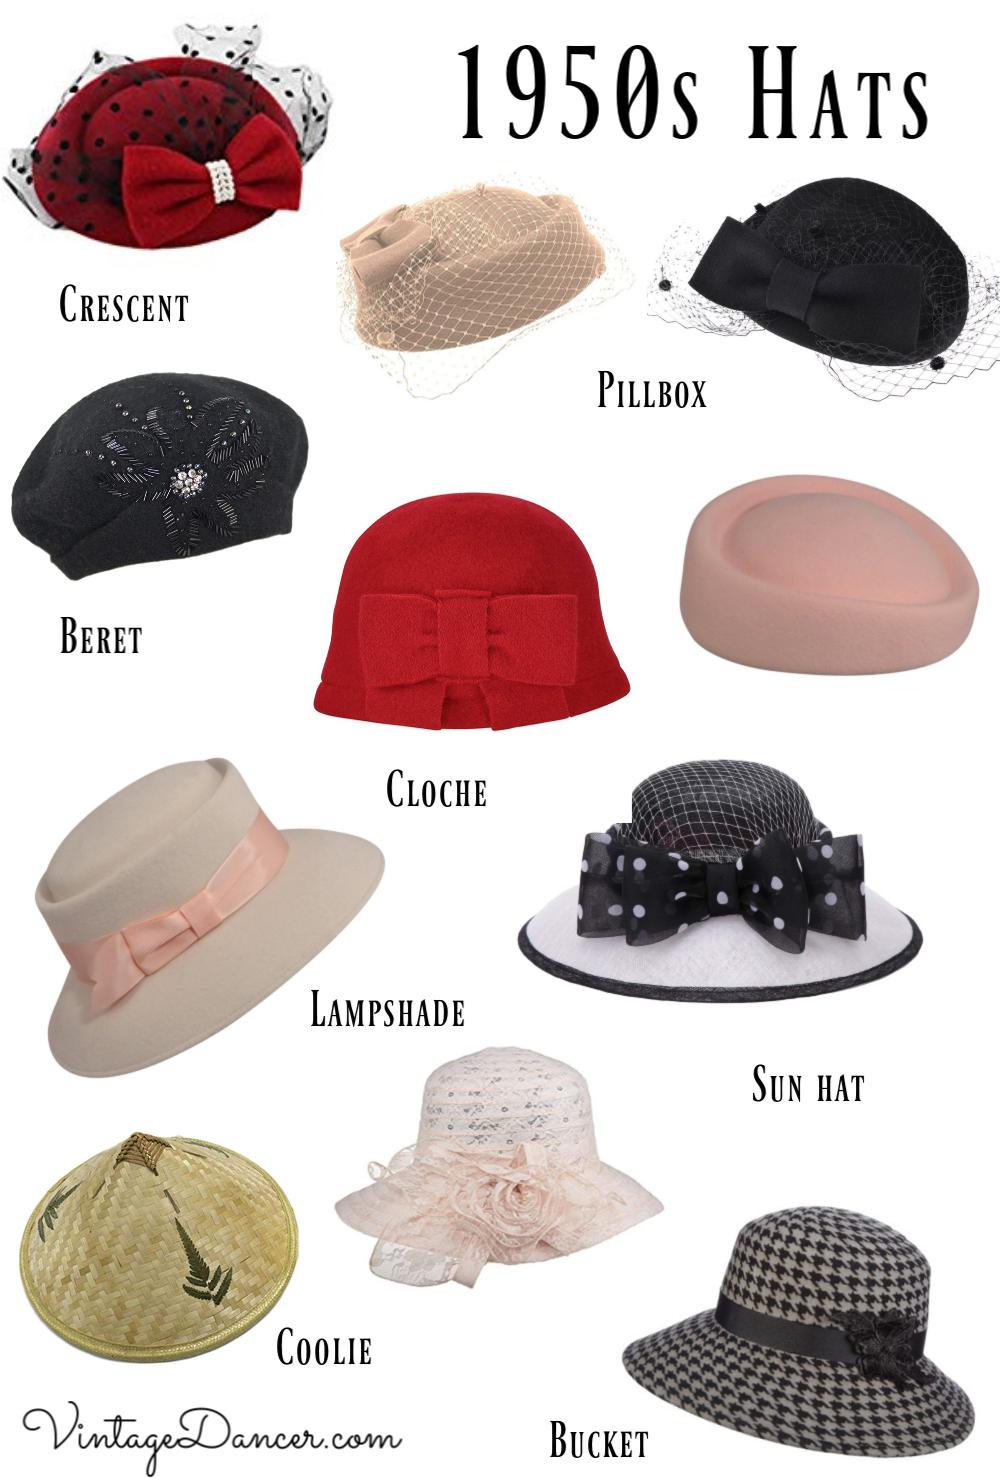 1950s Hats Pillbox Fascinator Wedding Sun Hats 1950s Hats Tea Hats Fascinator Hats